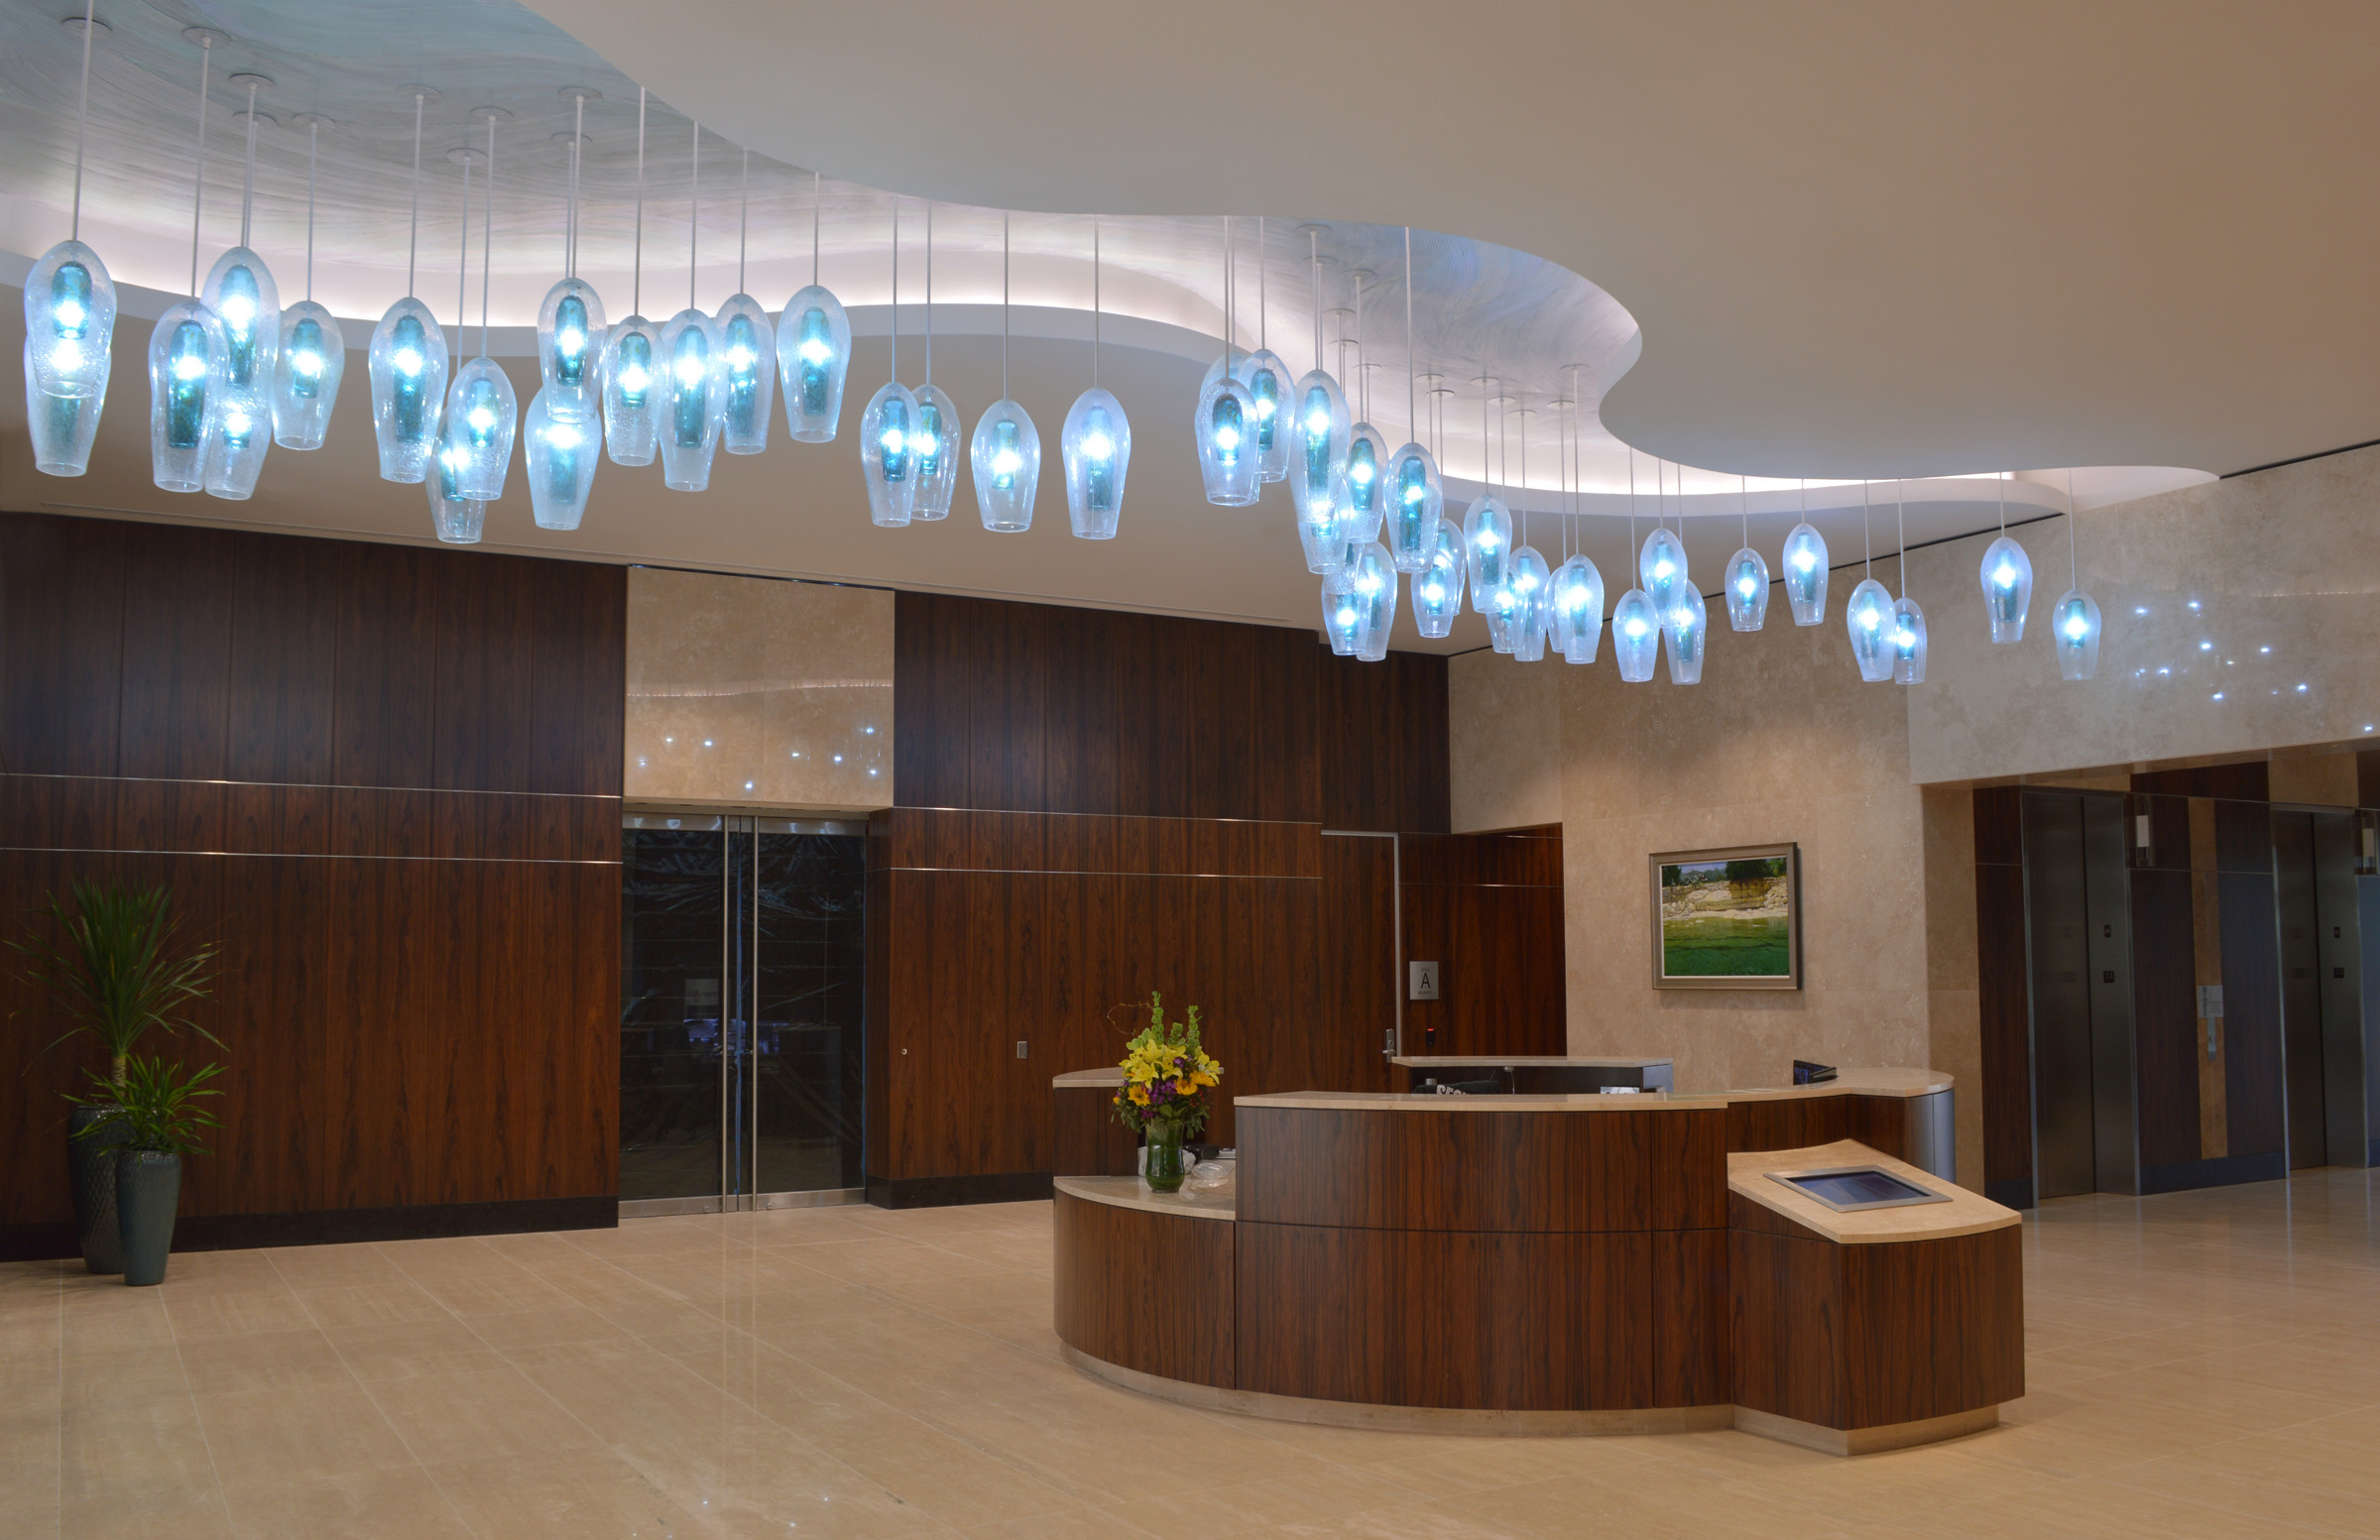 Wimberley Glassworks Briarpark Houston Blown Glass Lighting Installation North Lobby for web (2).jpg